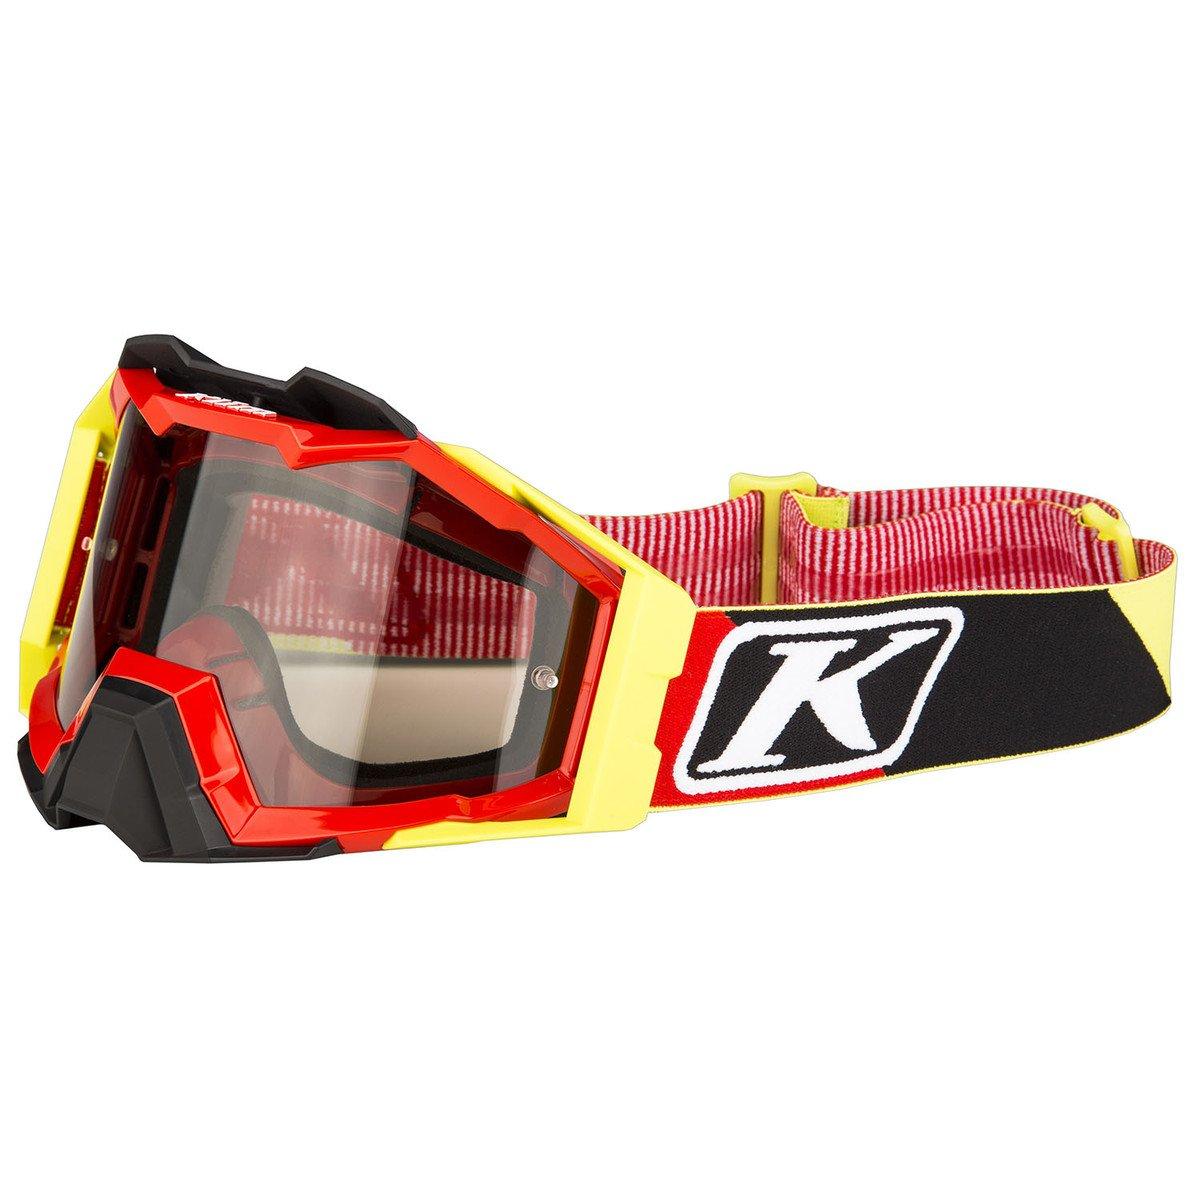 Diamond Fade Black - Smoke Silver Mirror and Lt Yellow Tint KLIM Oculus Goggle